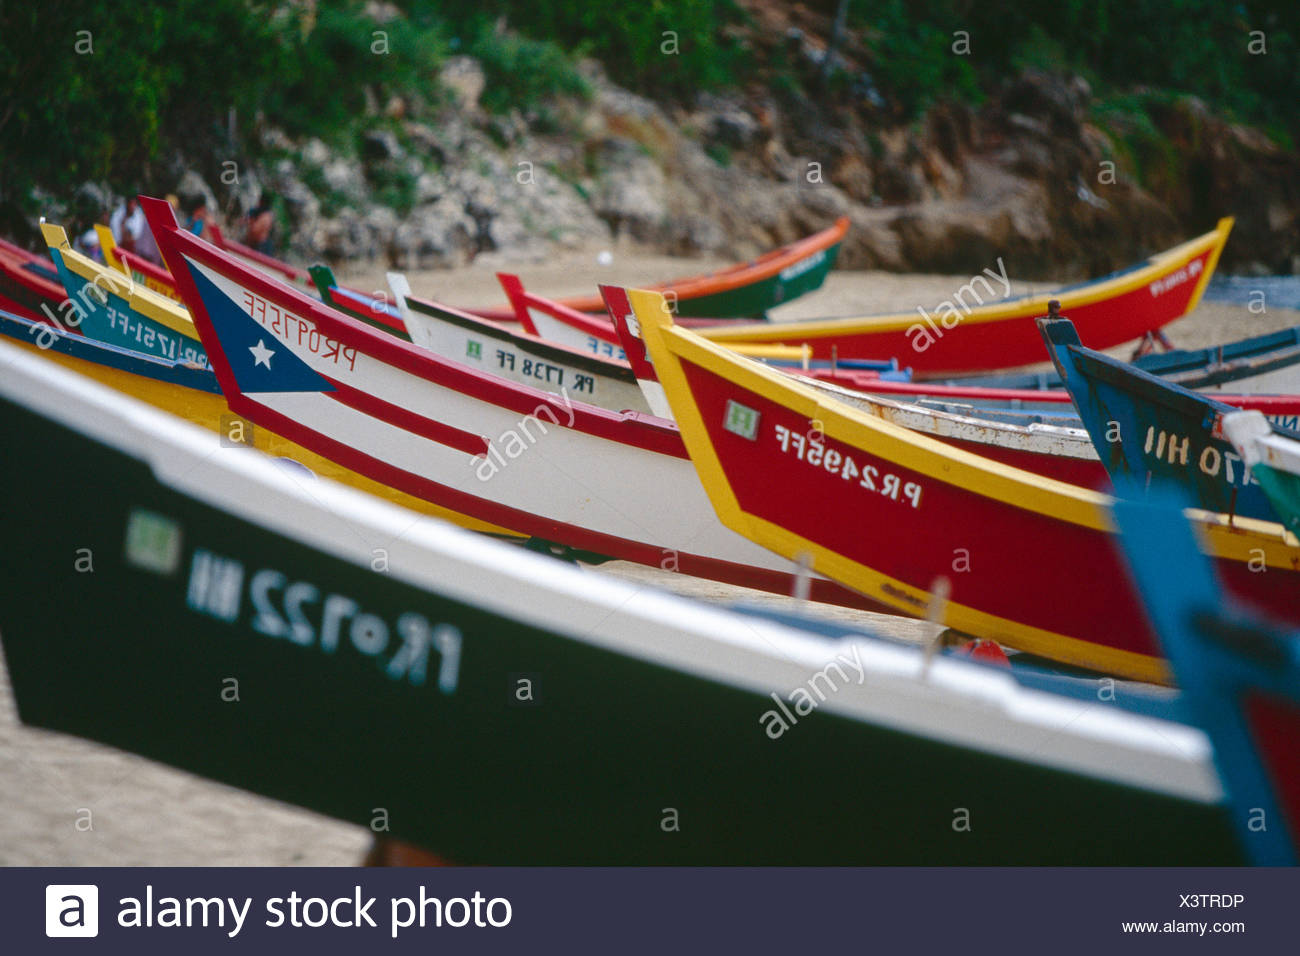 Puerto Rico, Aquadilla, Crashboat Beach, view of colorful fishing boats - Stock Image